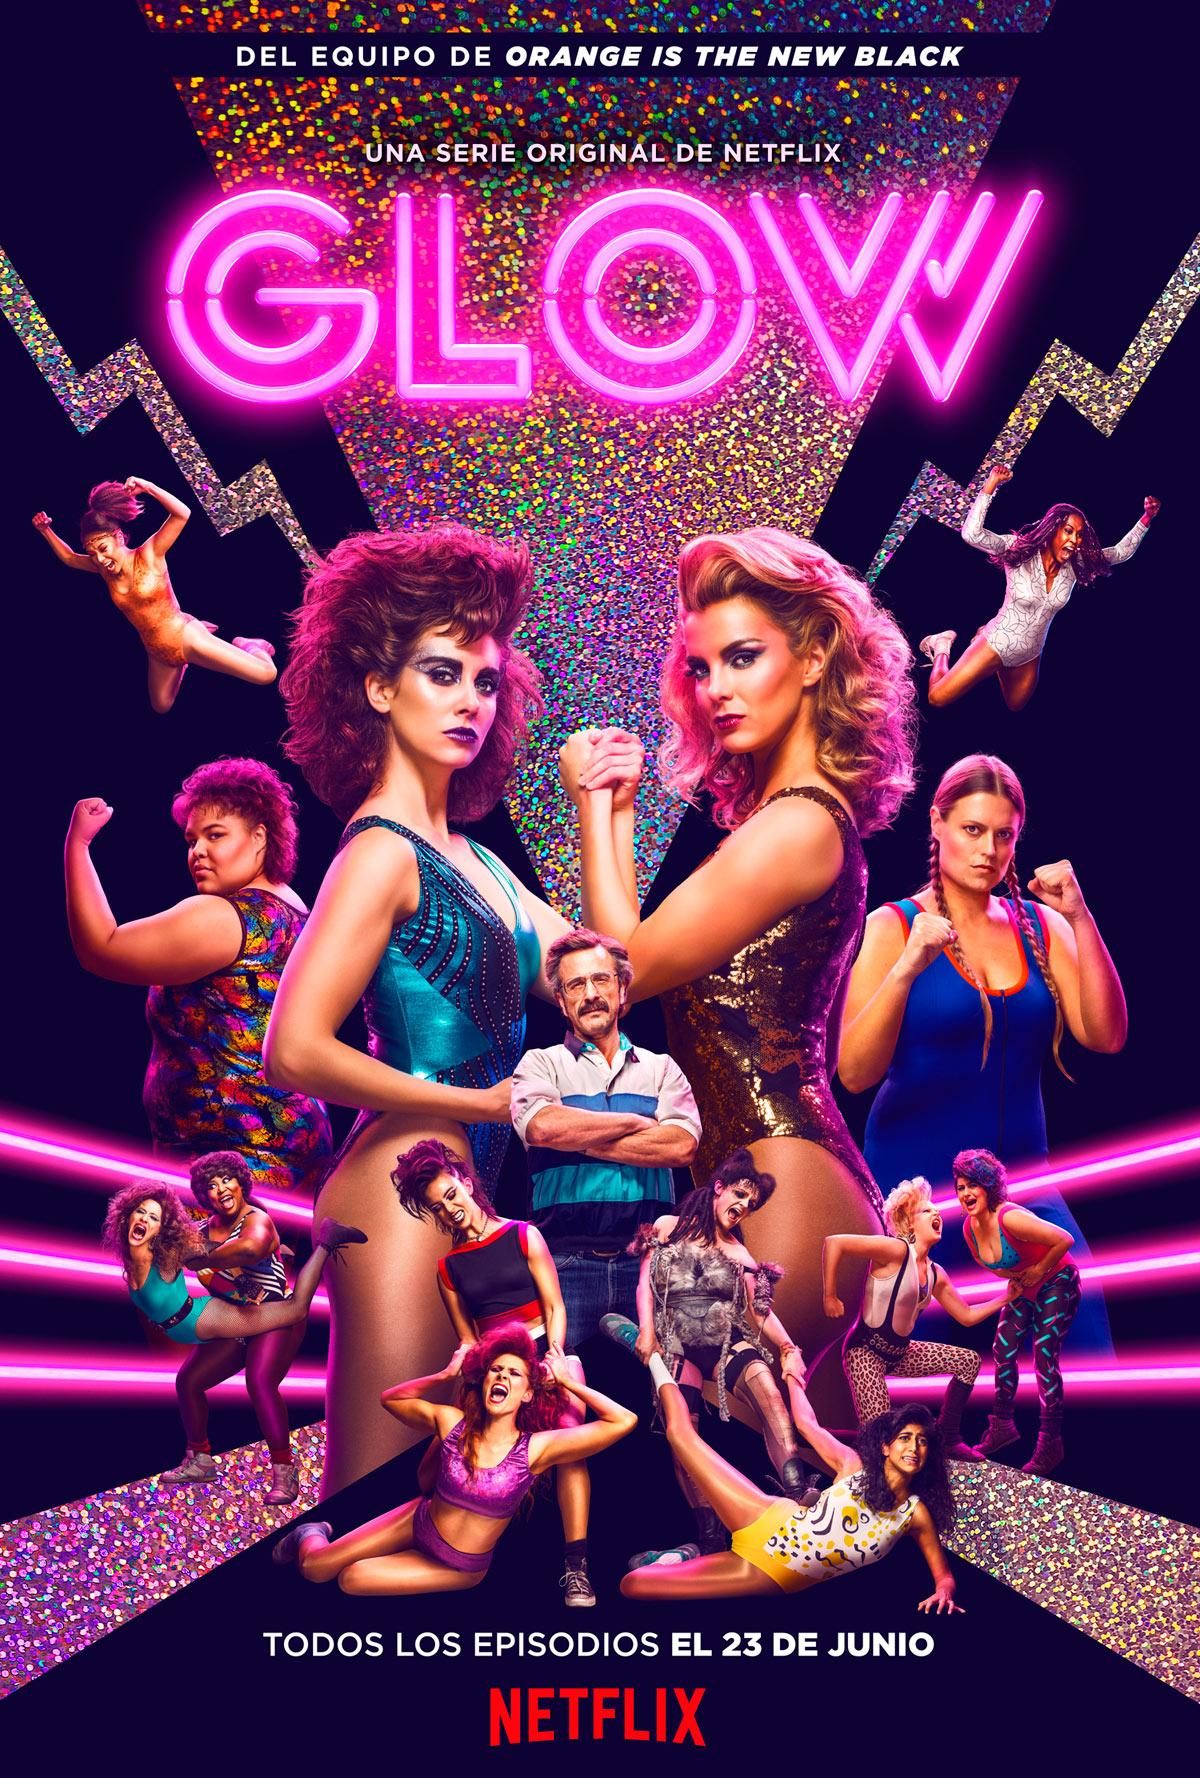 Glow poster 2